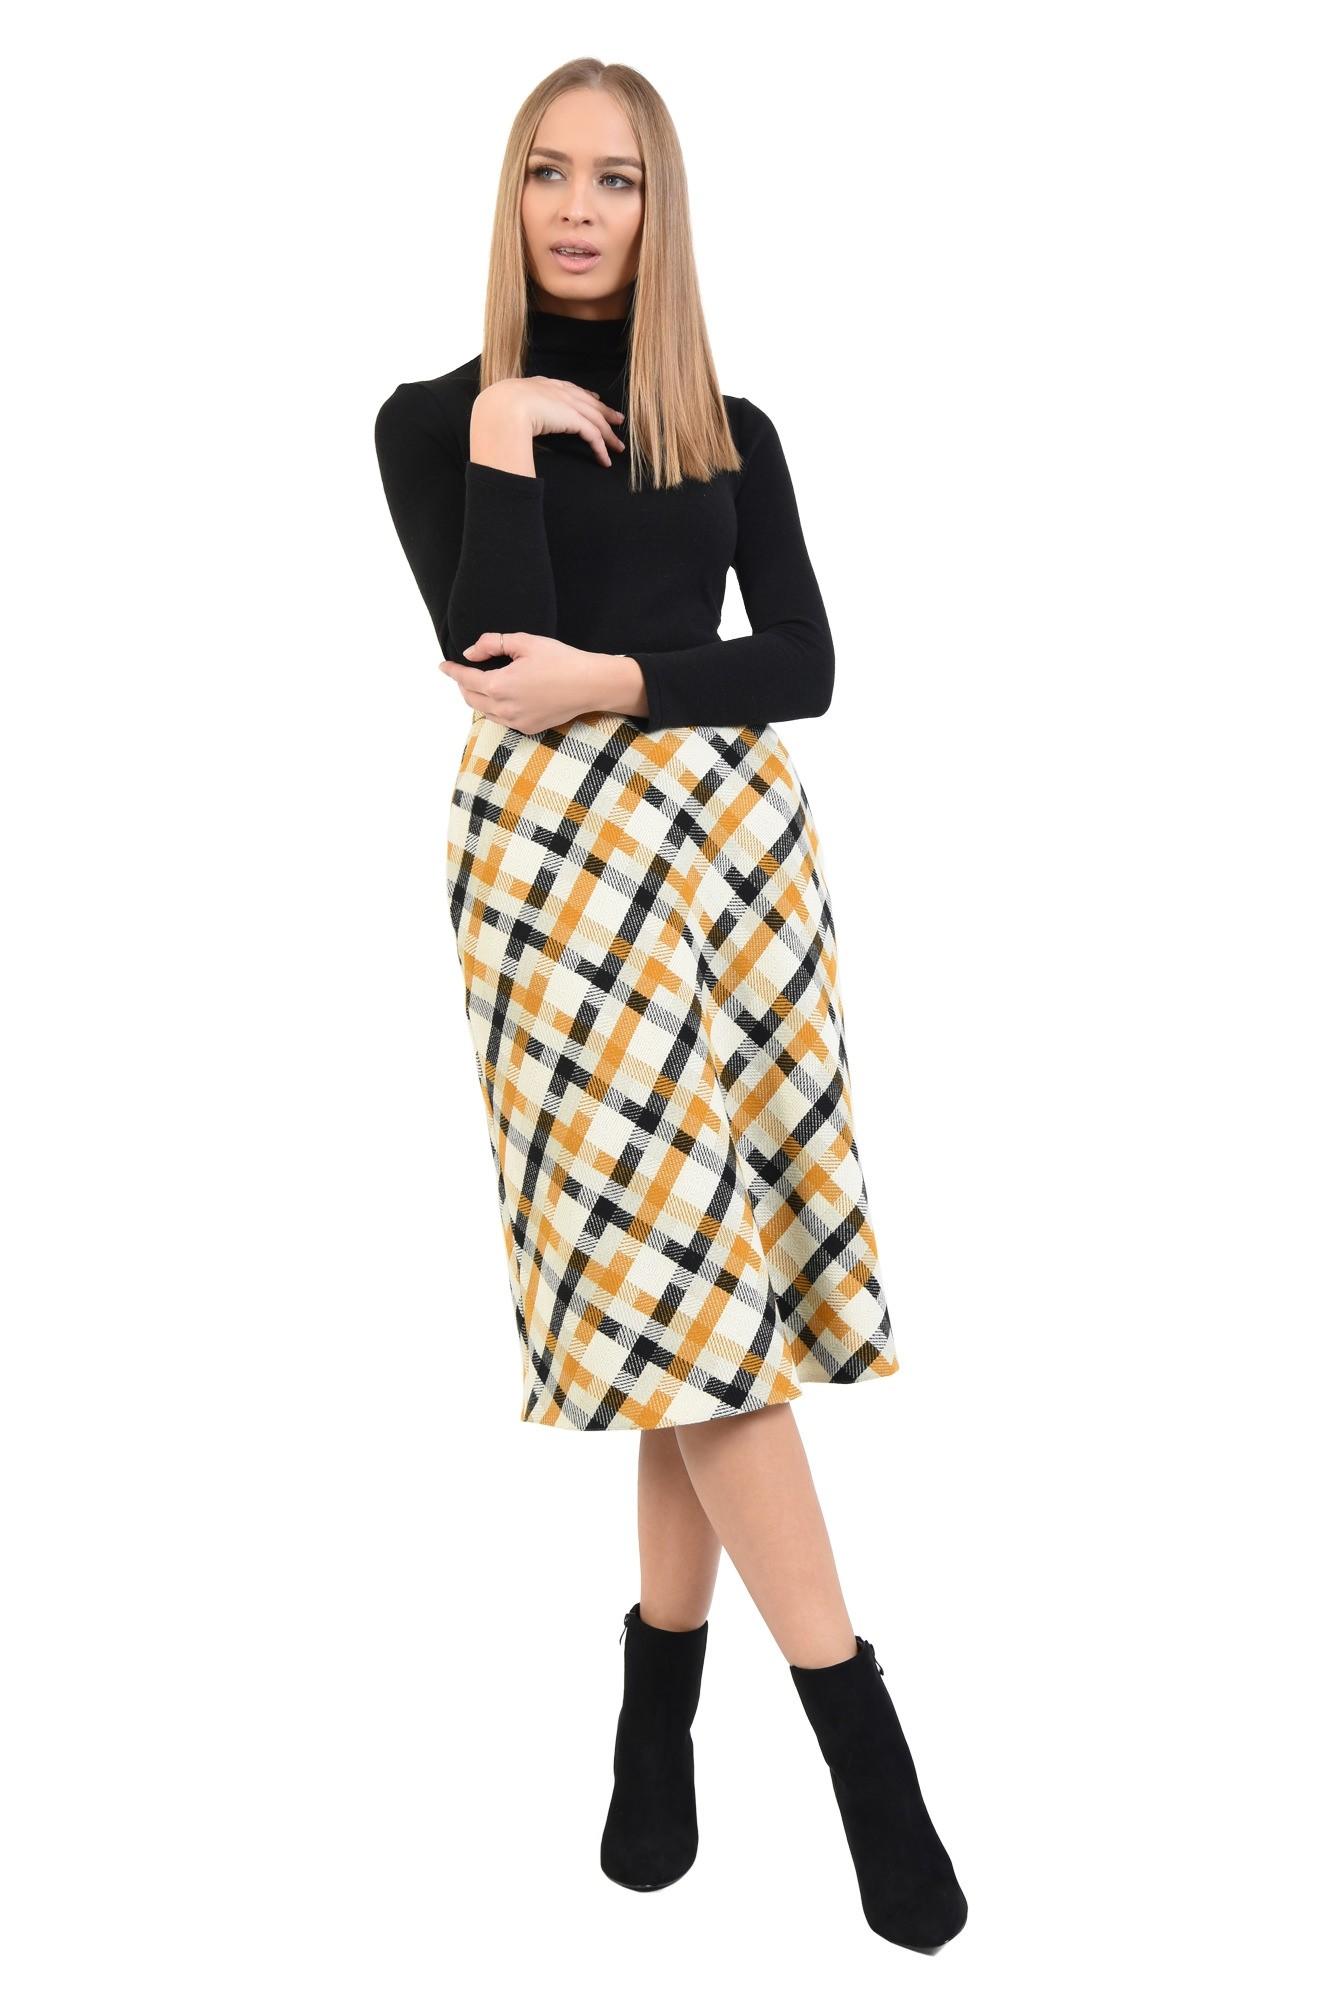 360 - fusta midi, evazata, amestec lana, carouri, alb, negru, mustar